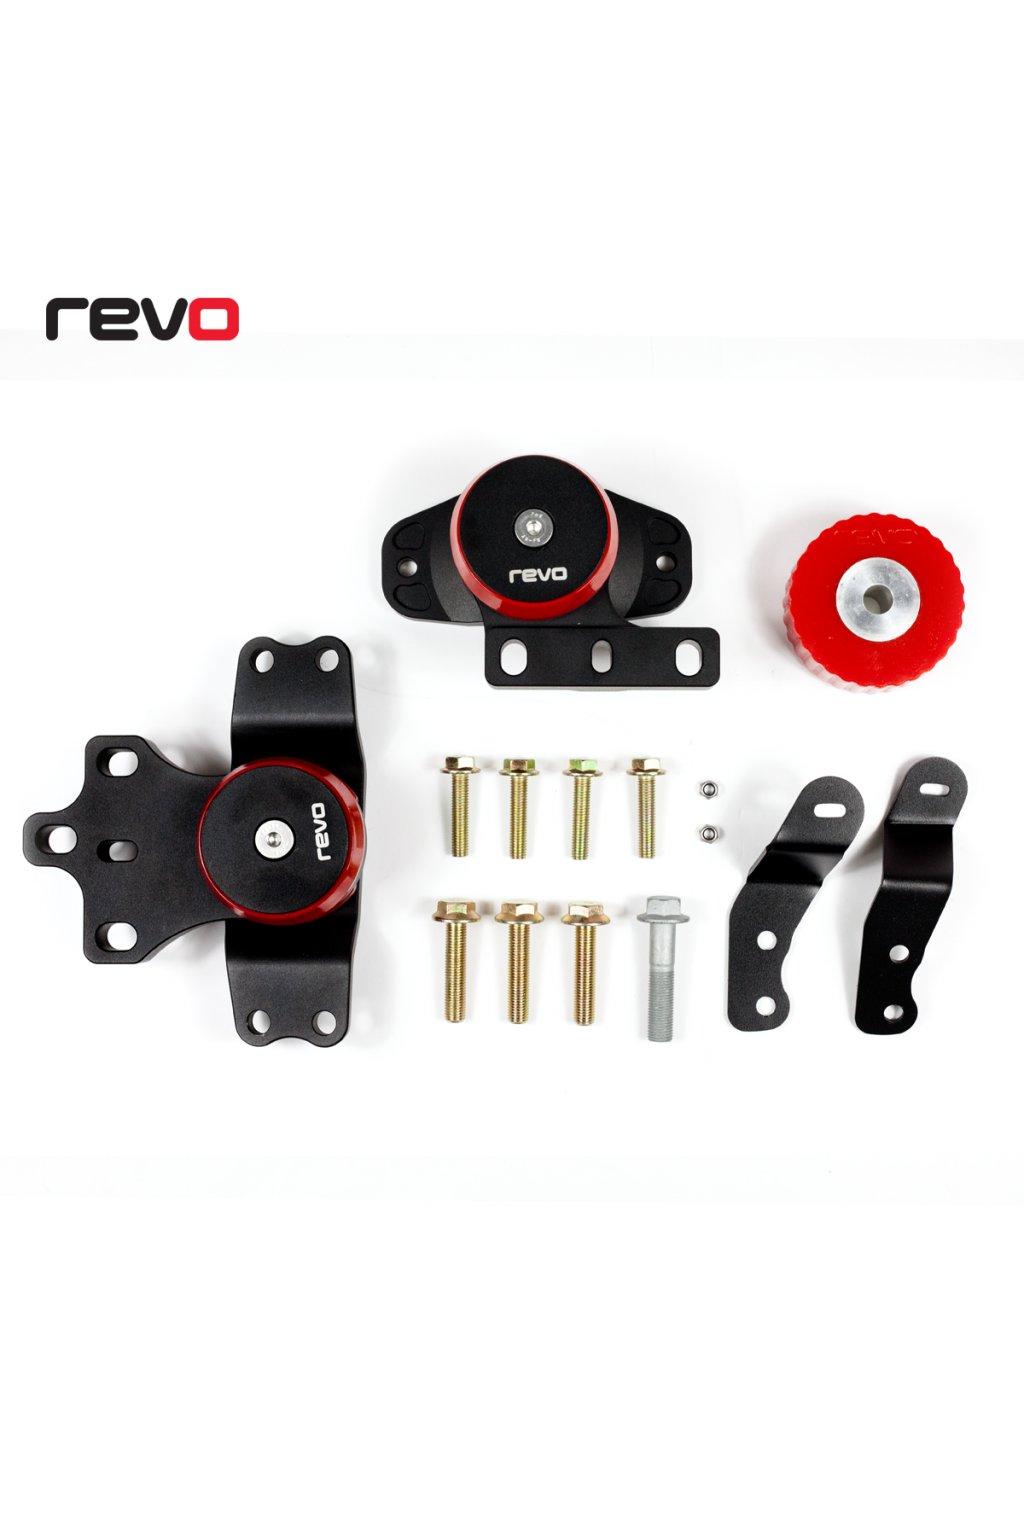 Revo MQB Motor Mount Full Set with Install Tool